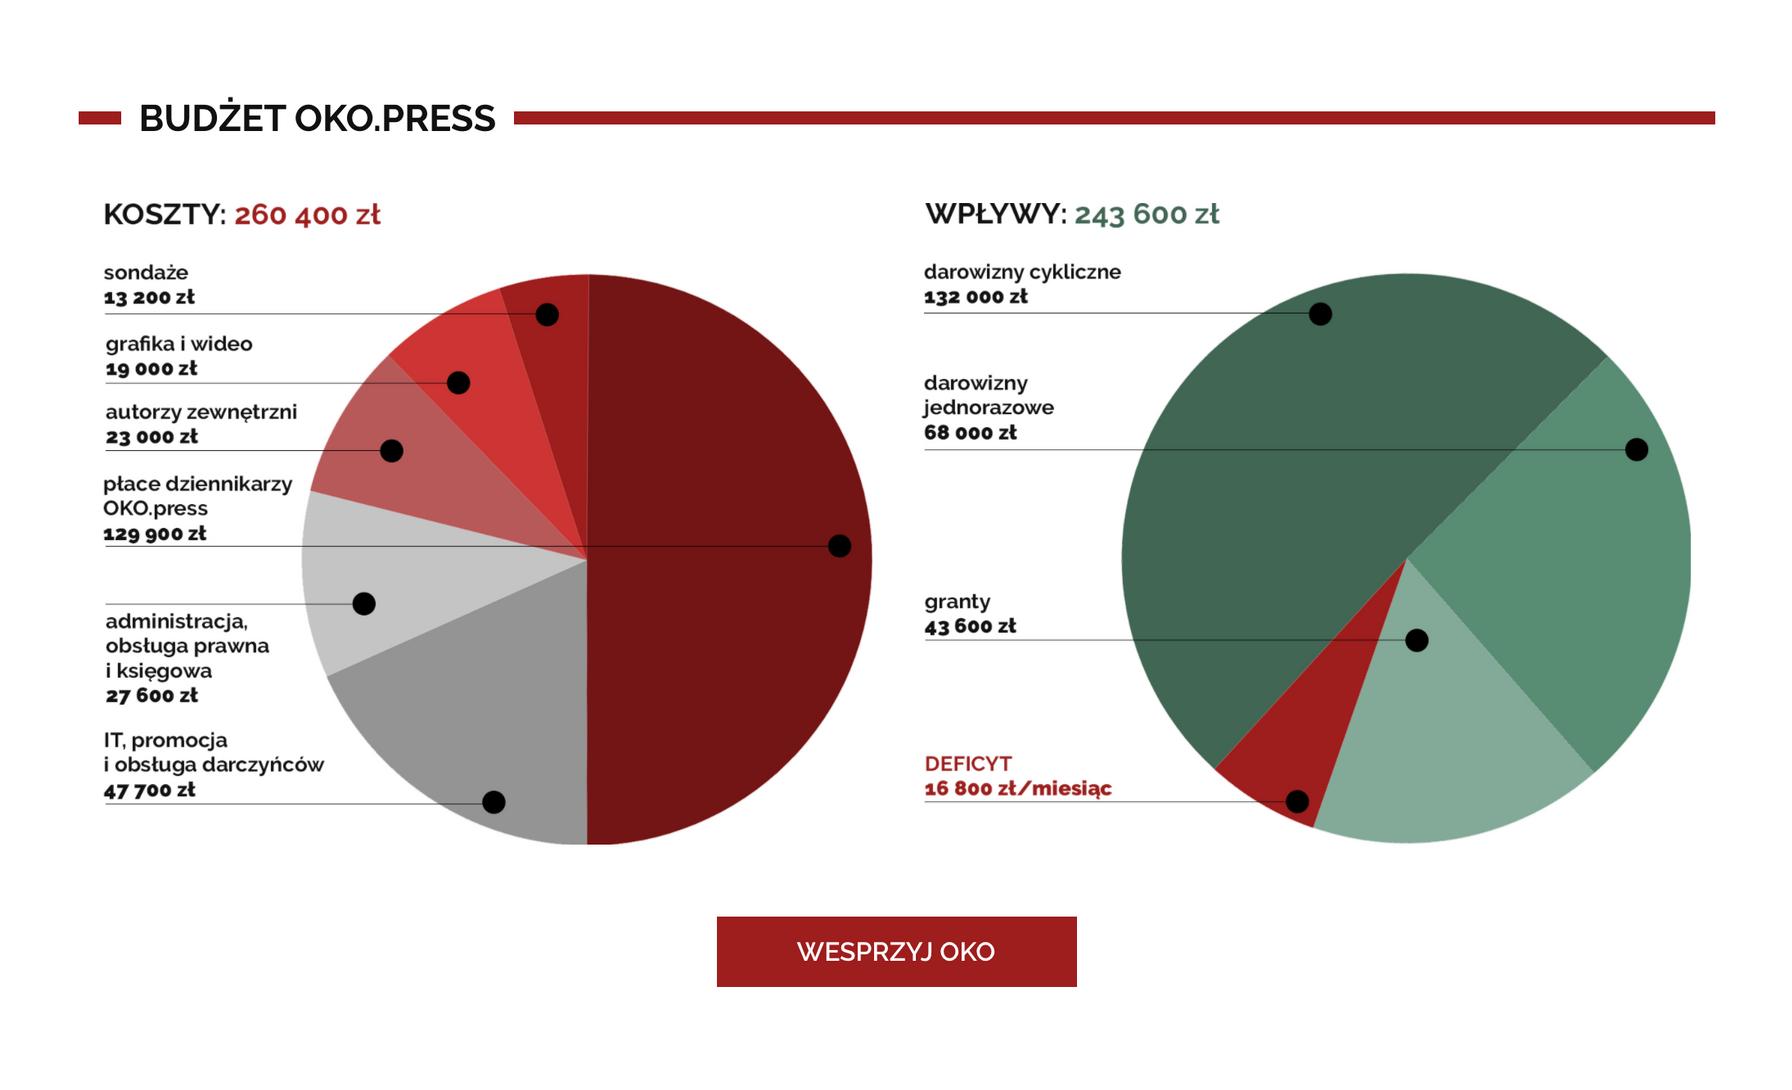 Budżet OKO.press